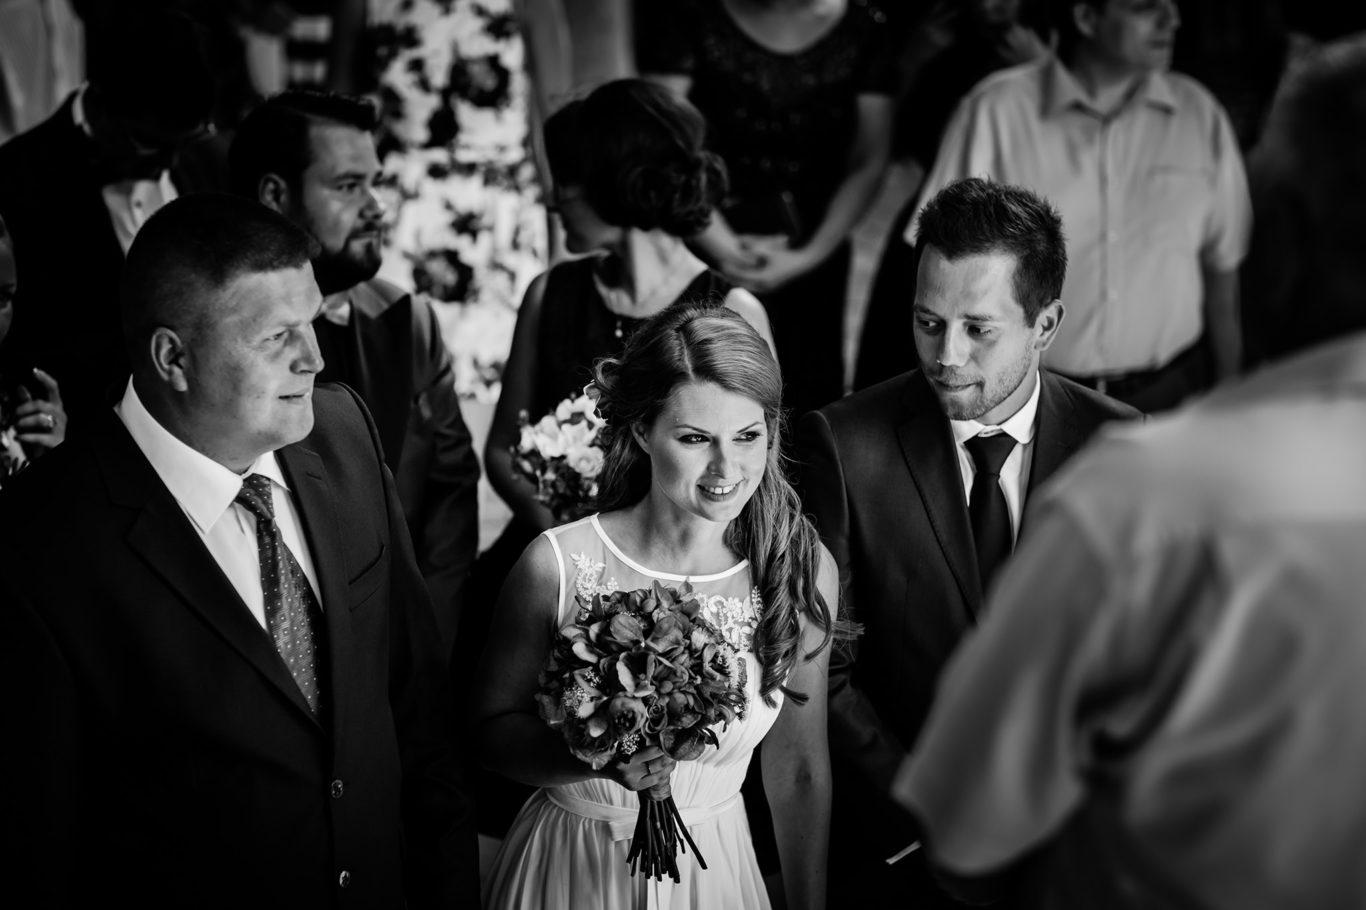 0316-fotografie-nunta-bucuresti-rodica-rares-fotograf-ciprian-dumitrescu-cd2_0294-2